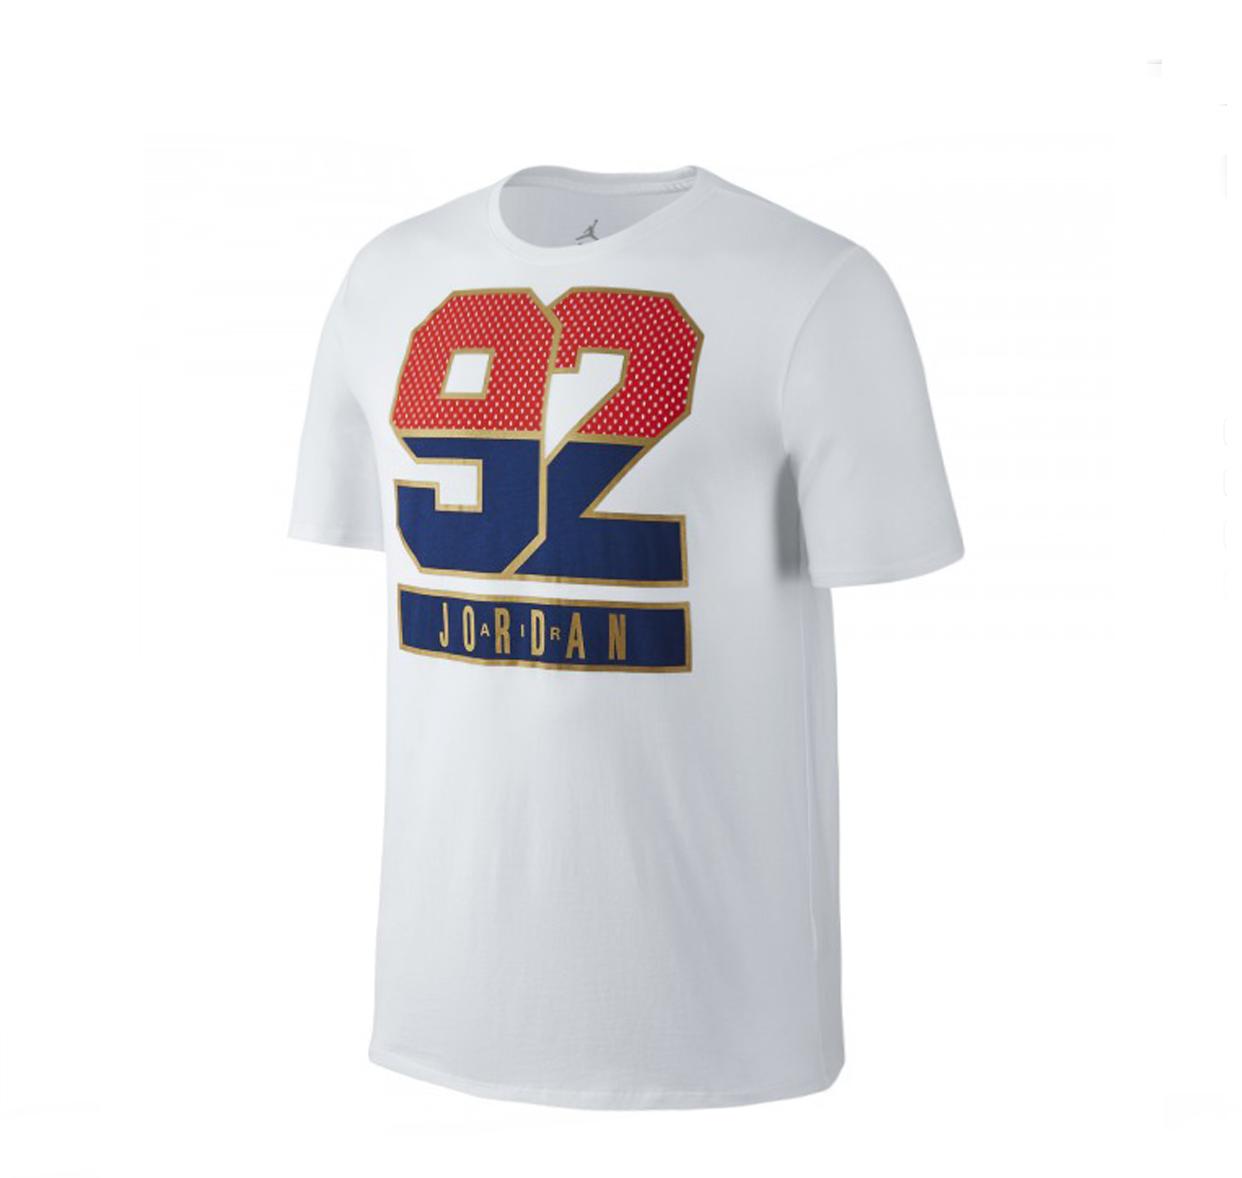 Hoodshop for 92 dream team t shirt